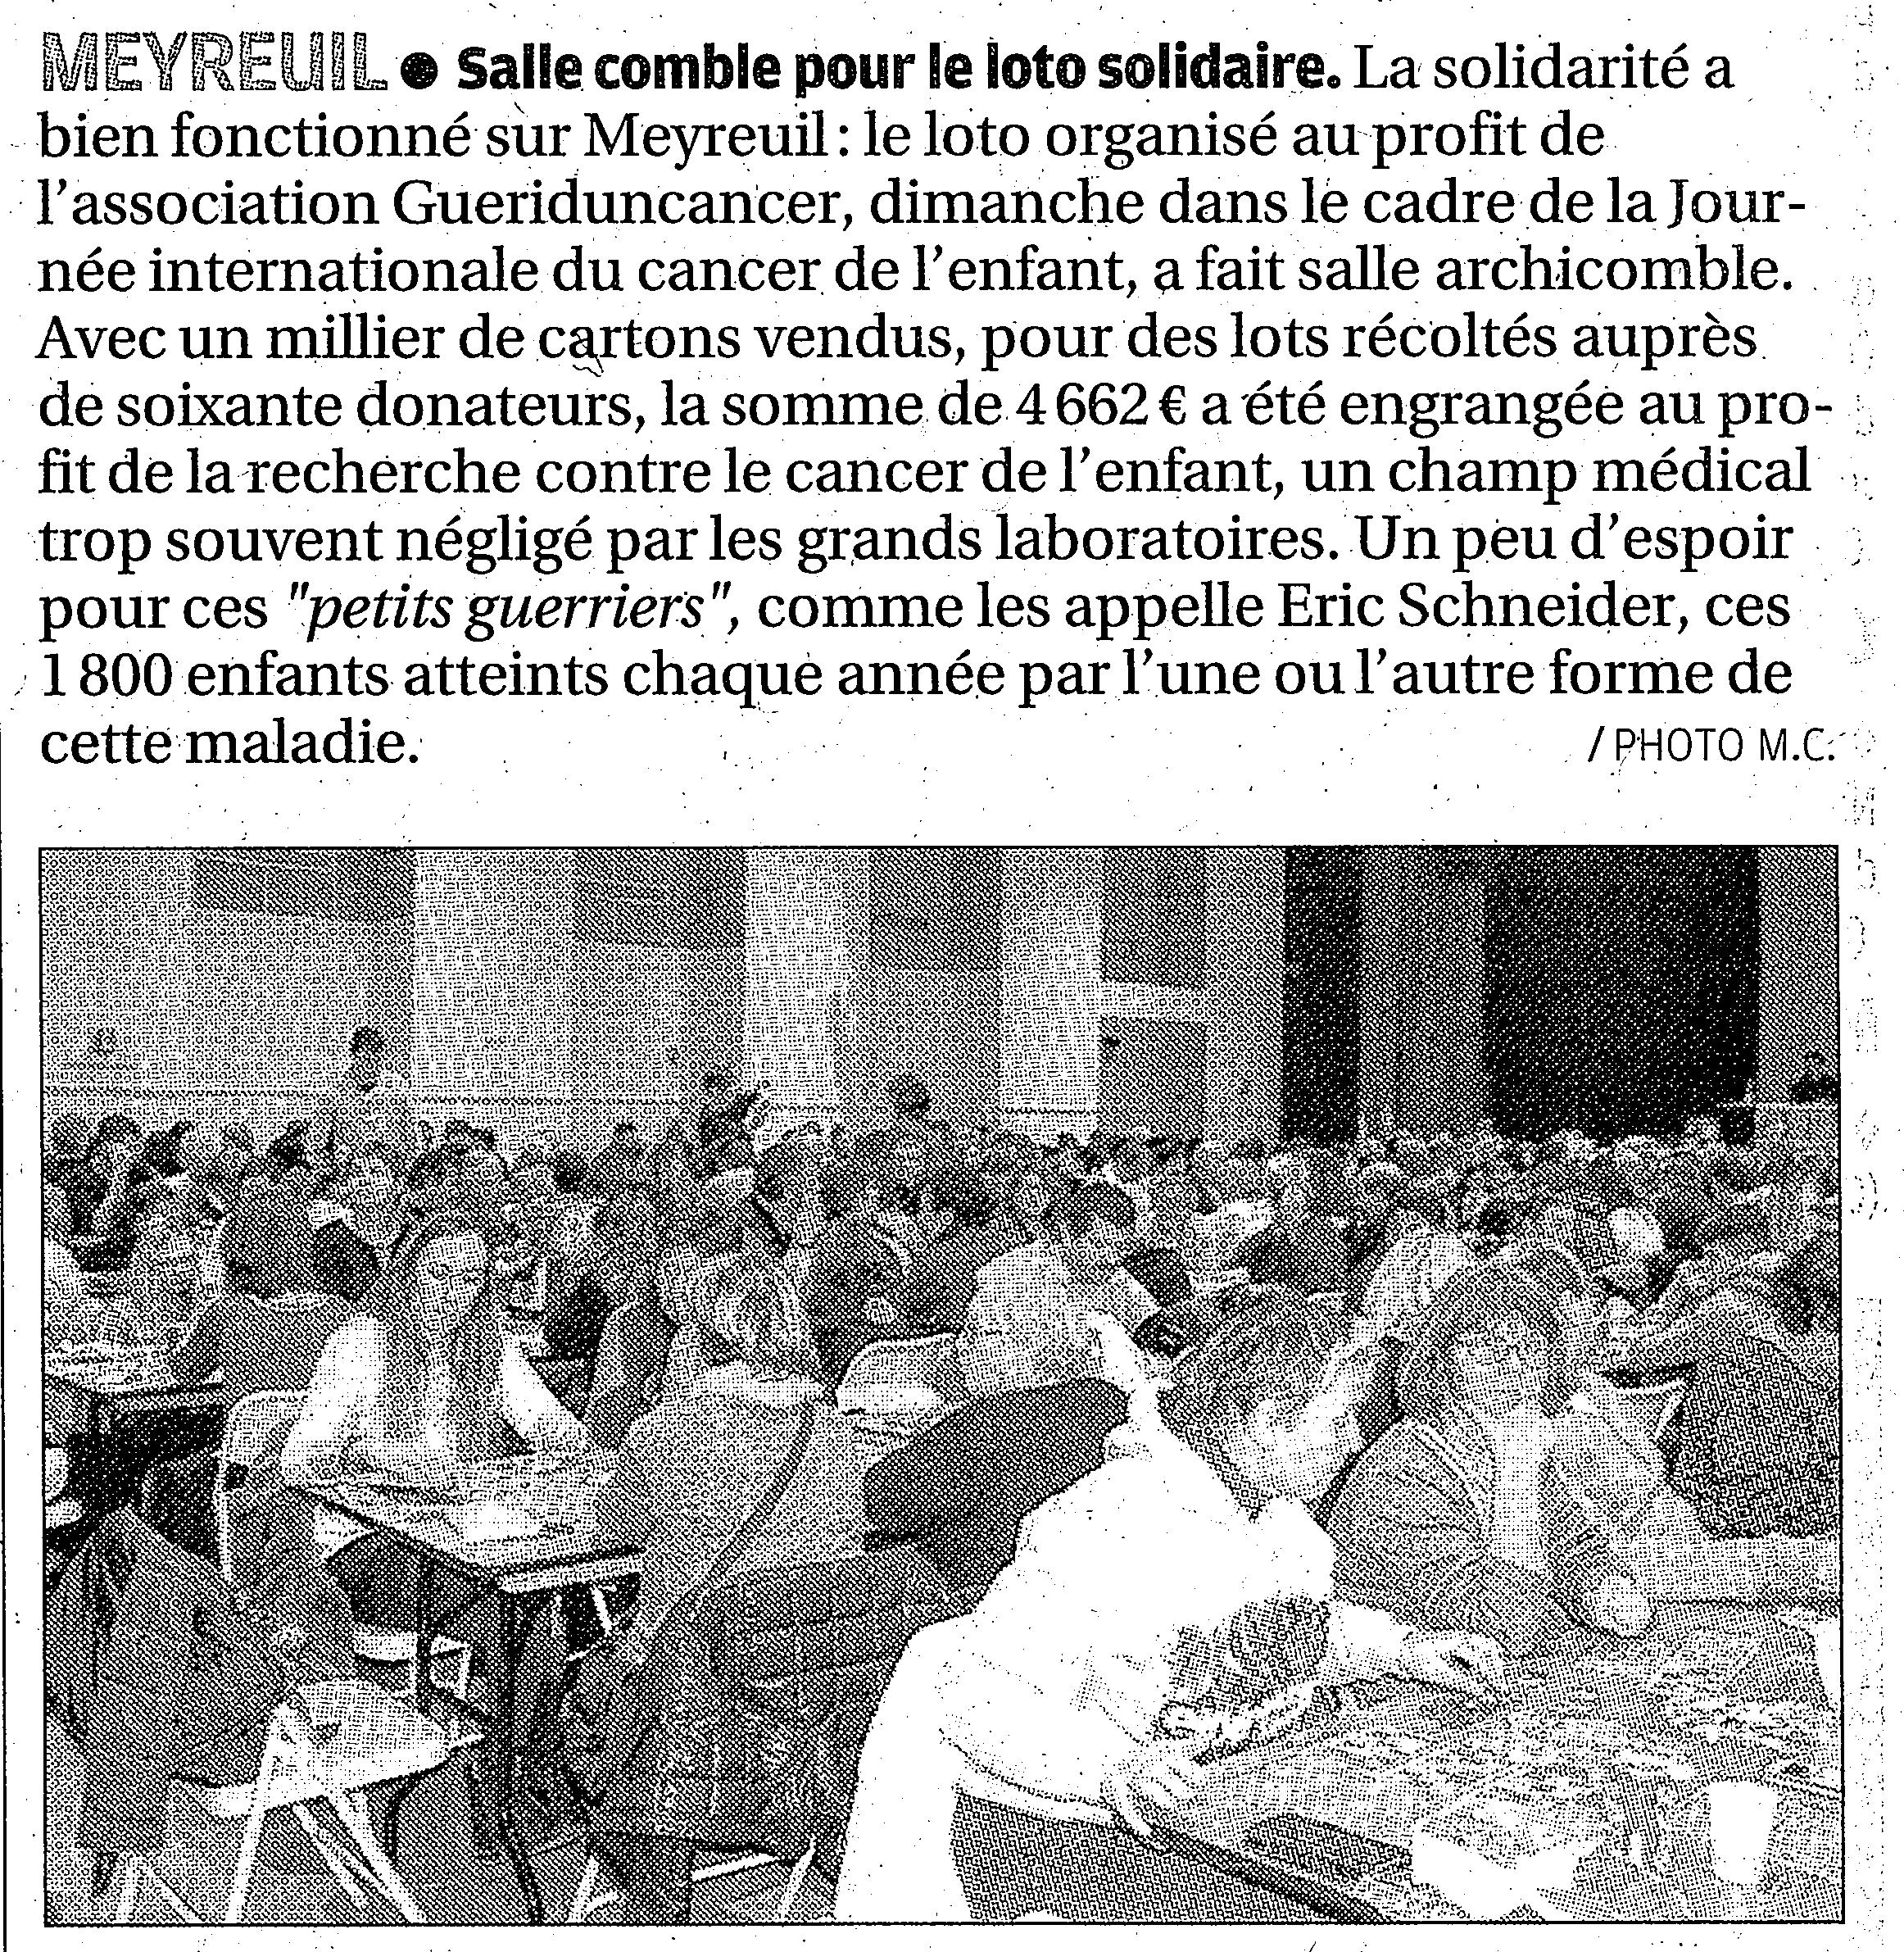 LOTO_LA PROVENCE_15 2 17.png